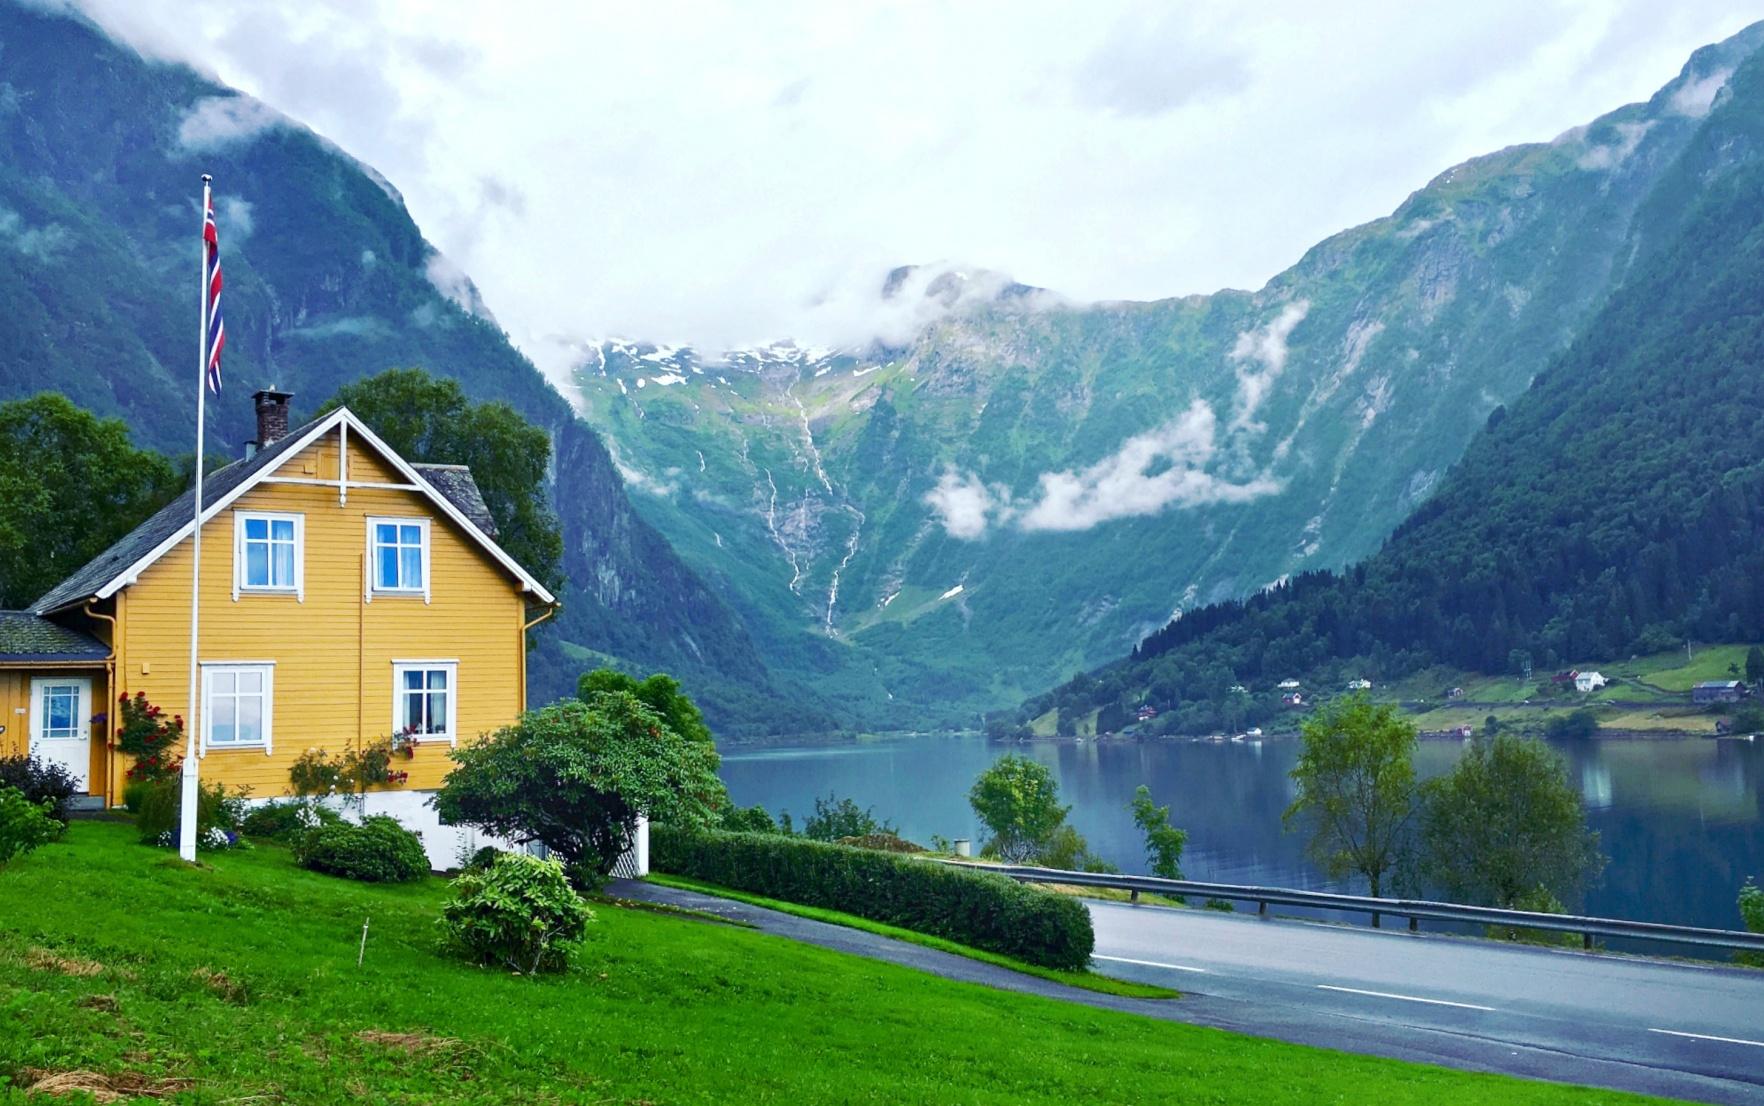 Norway House near the lake shore